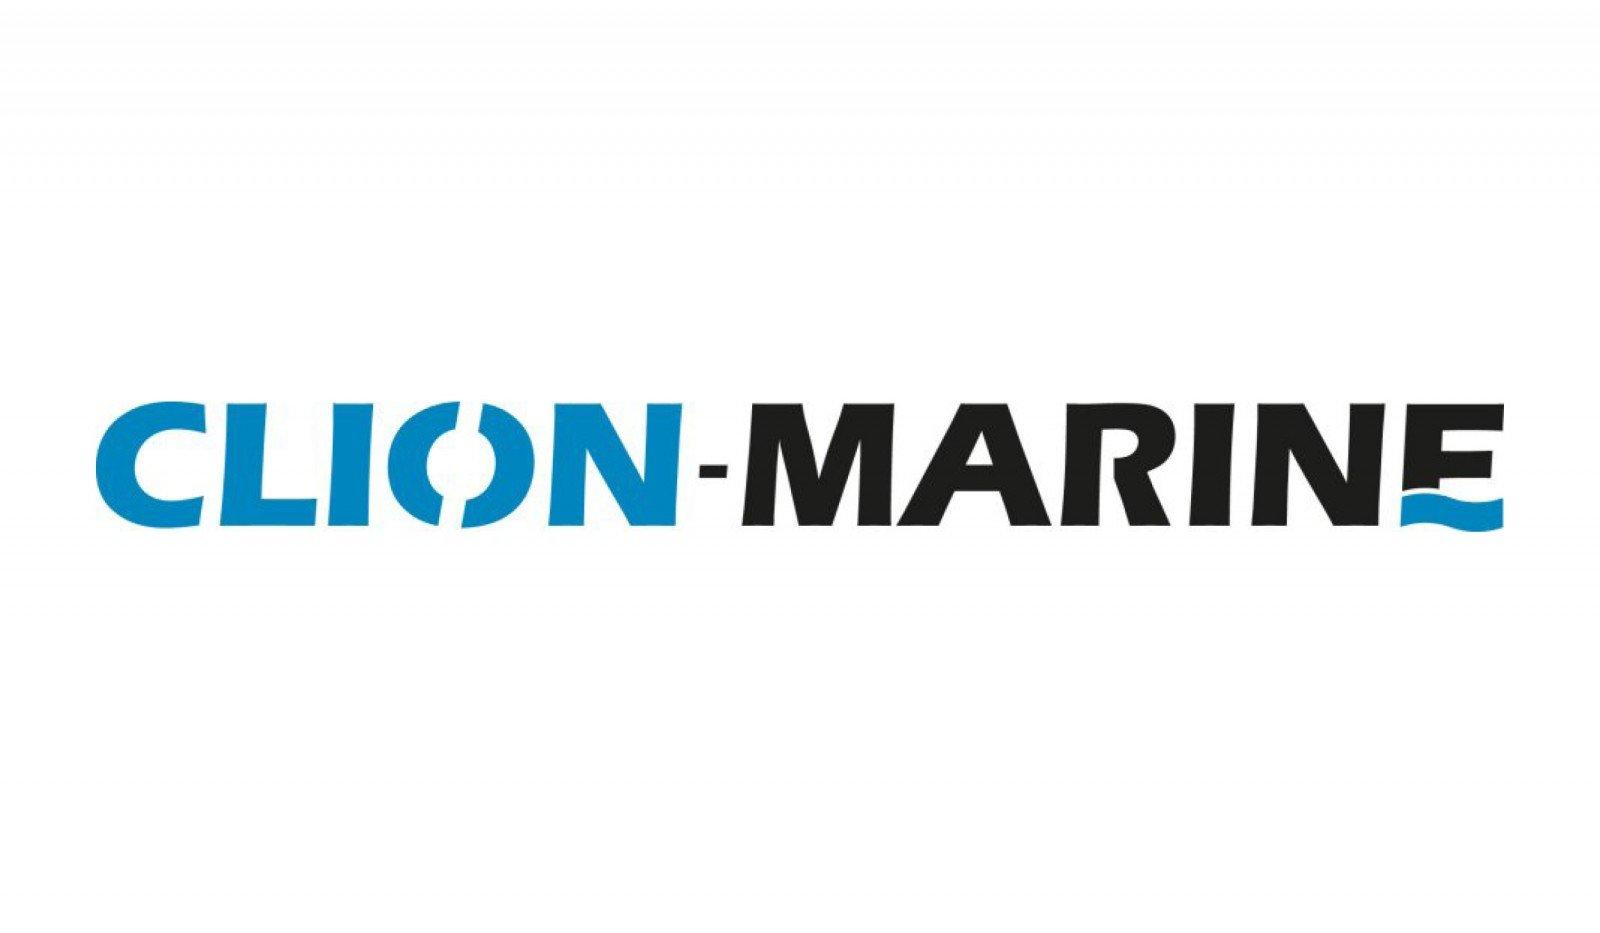 Clion-Marine